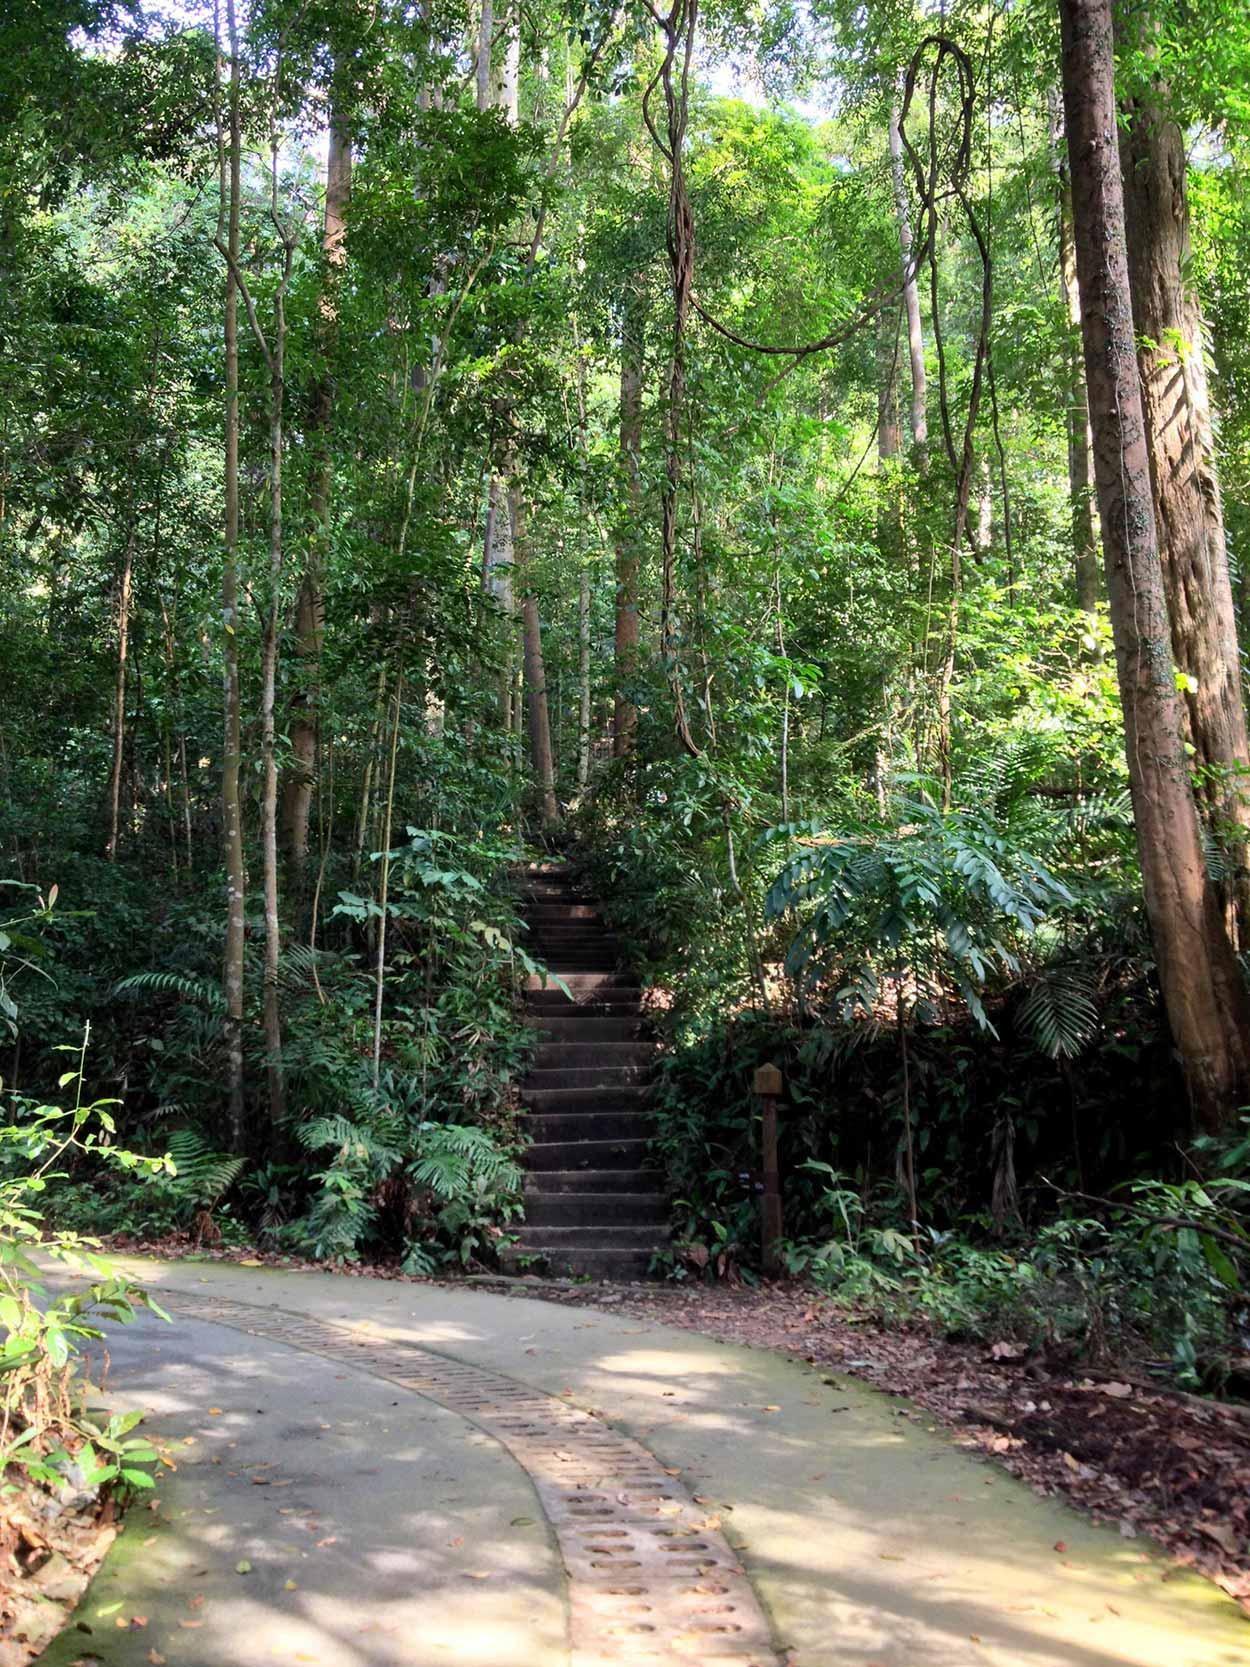 Up those stairs to the summit of Singapore, Bukit Timah, Singapore